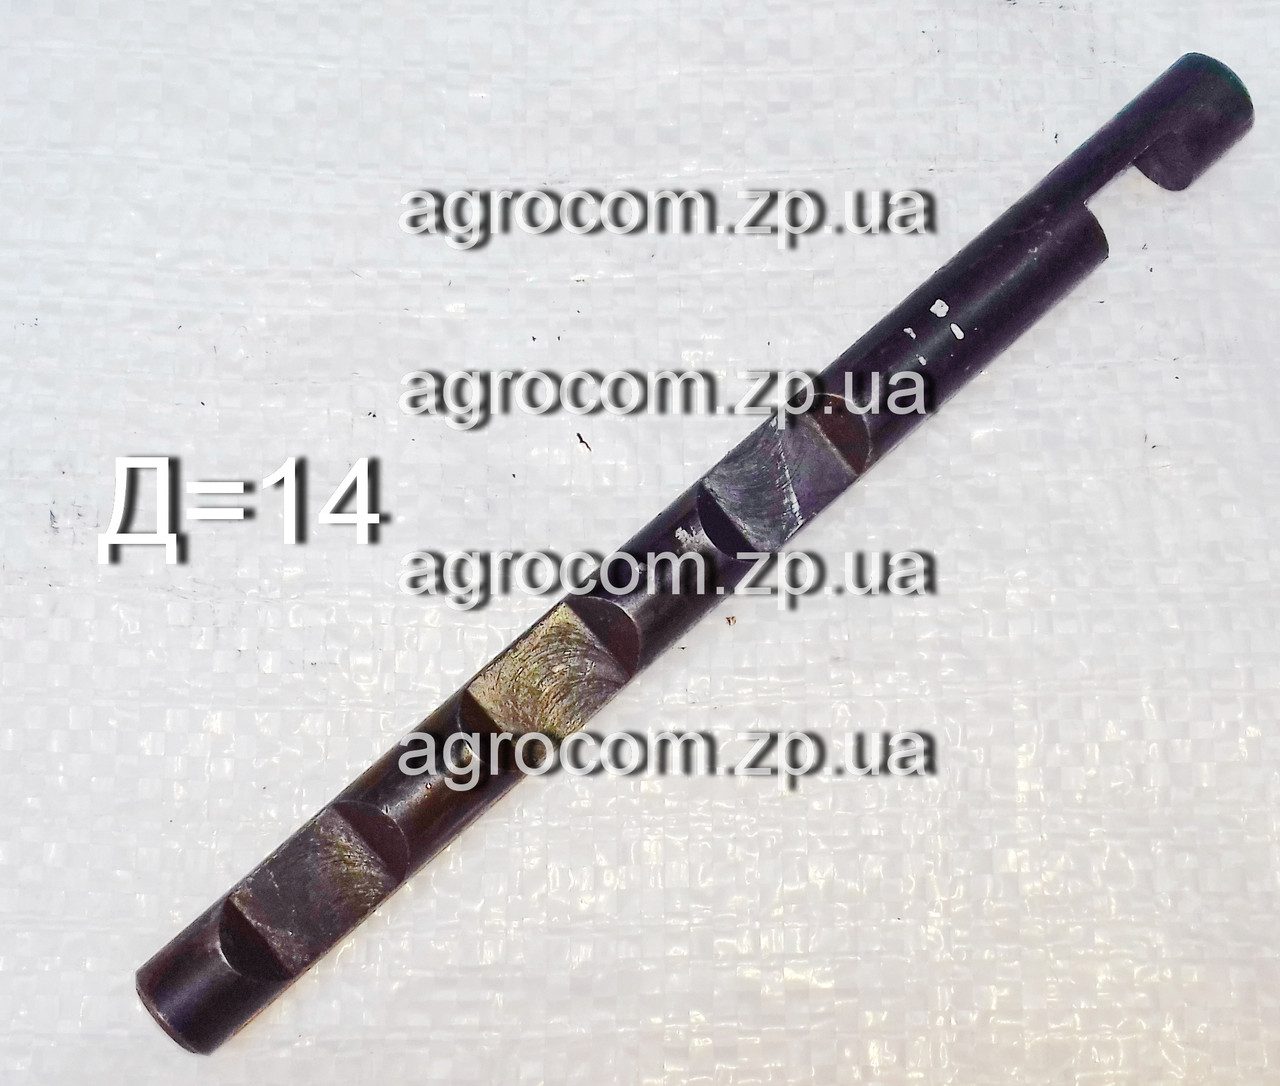 Валик блокировки КПП А25.37.188 (Т-25, Д-21) д=14